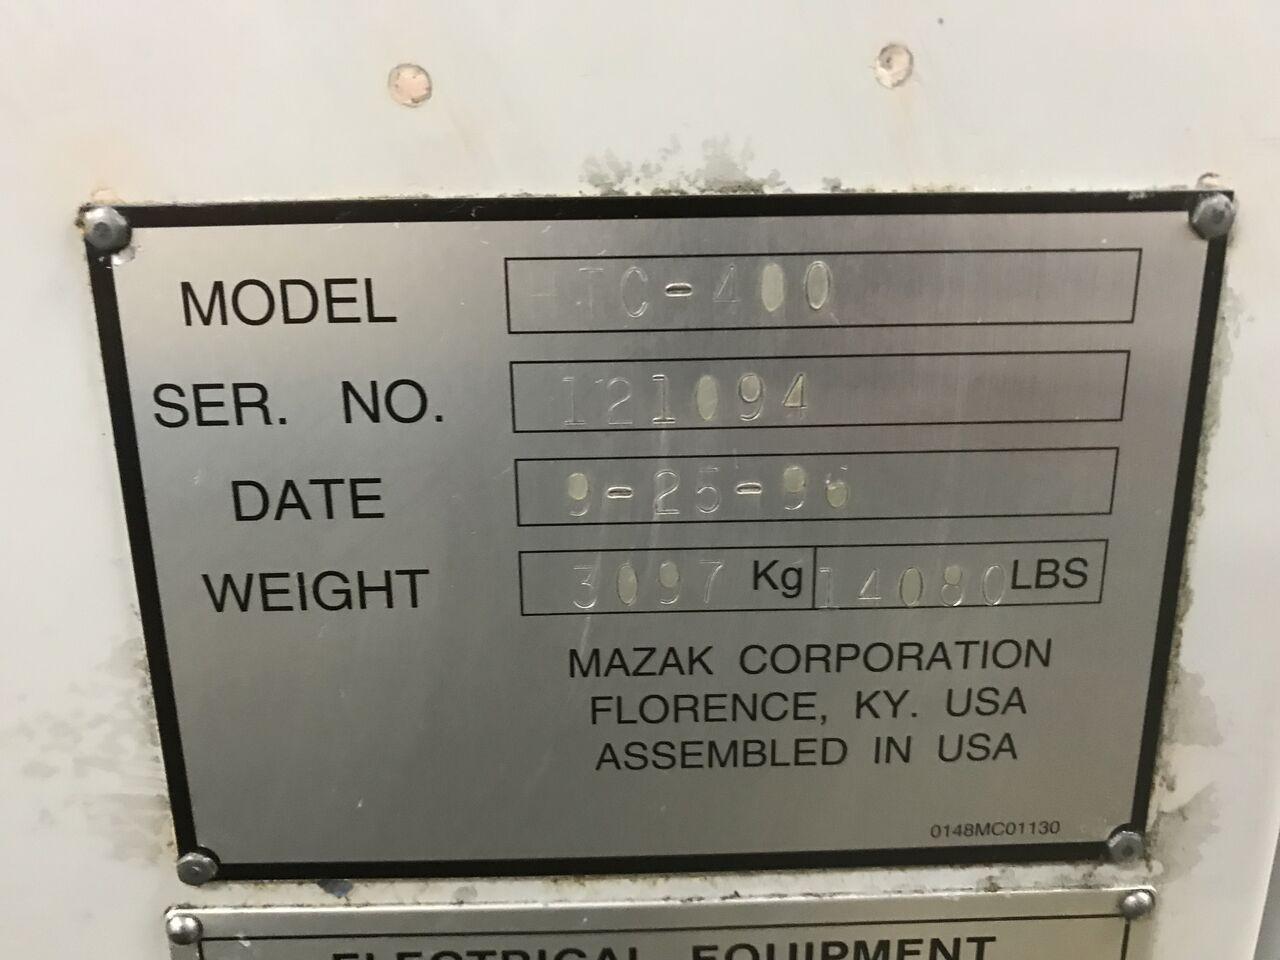 Lot 10 - Mazak HTC-400, Serial # = 121094, Volts = 230/480, Date = 9-25-96, (Jorgensan Conveyor Attached)